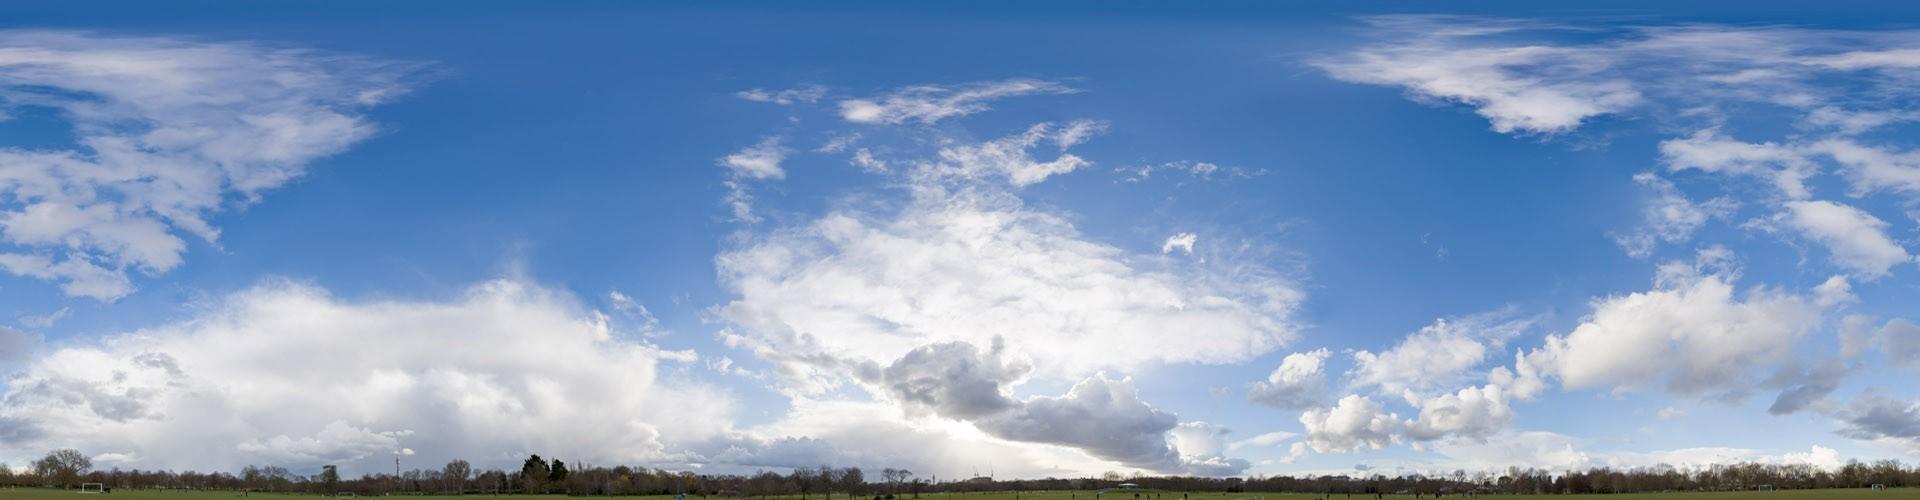 Rainy Clouds 2858 (60k) HDRI